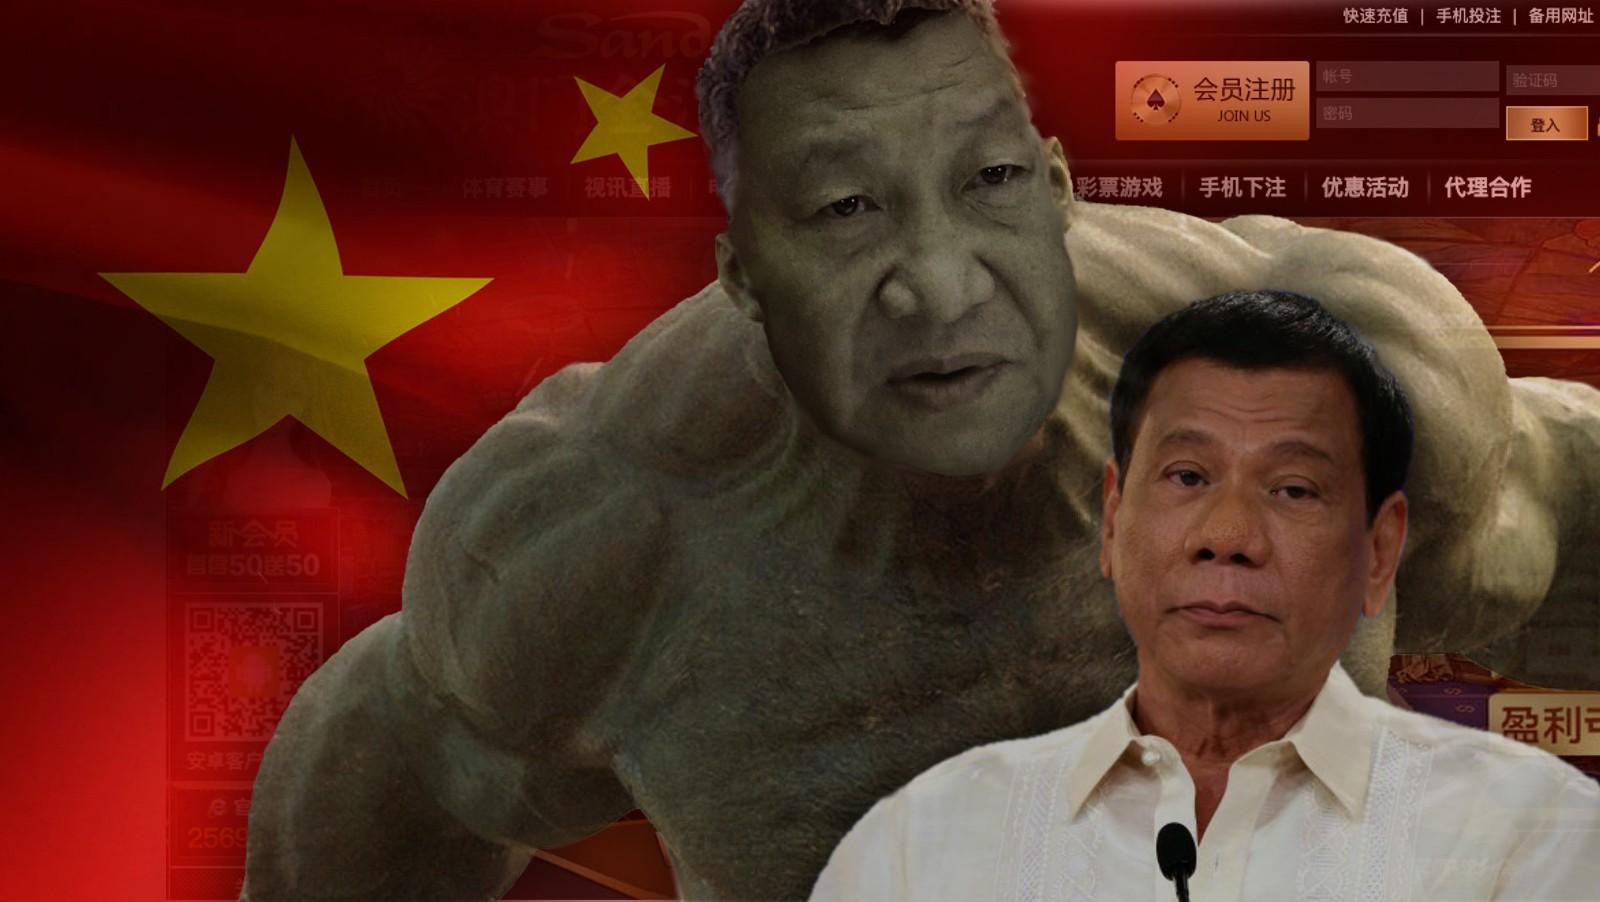 2019-year-in-review-gambling-china-online-gambling-fp